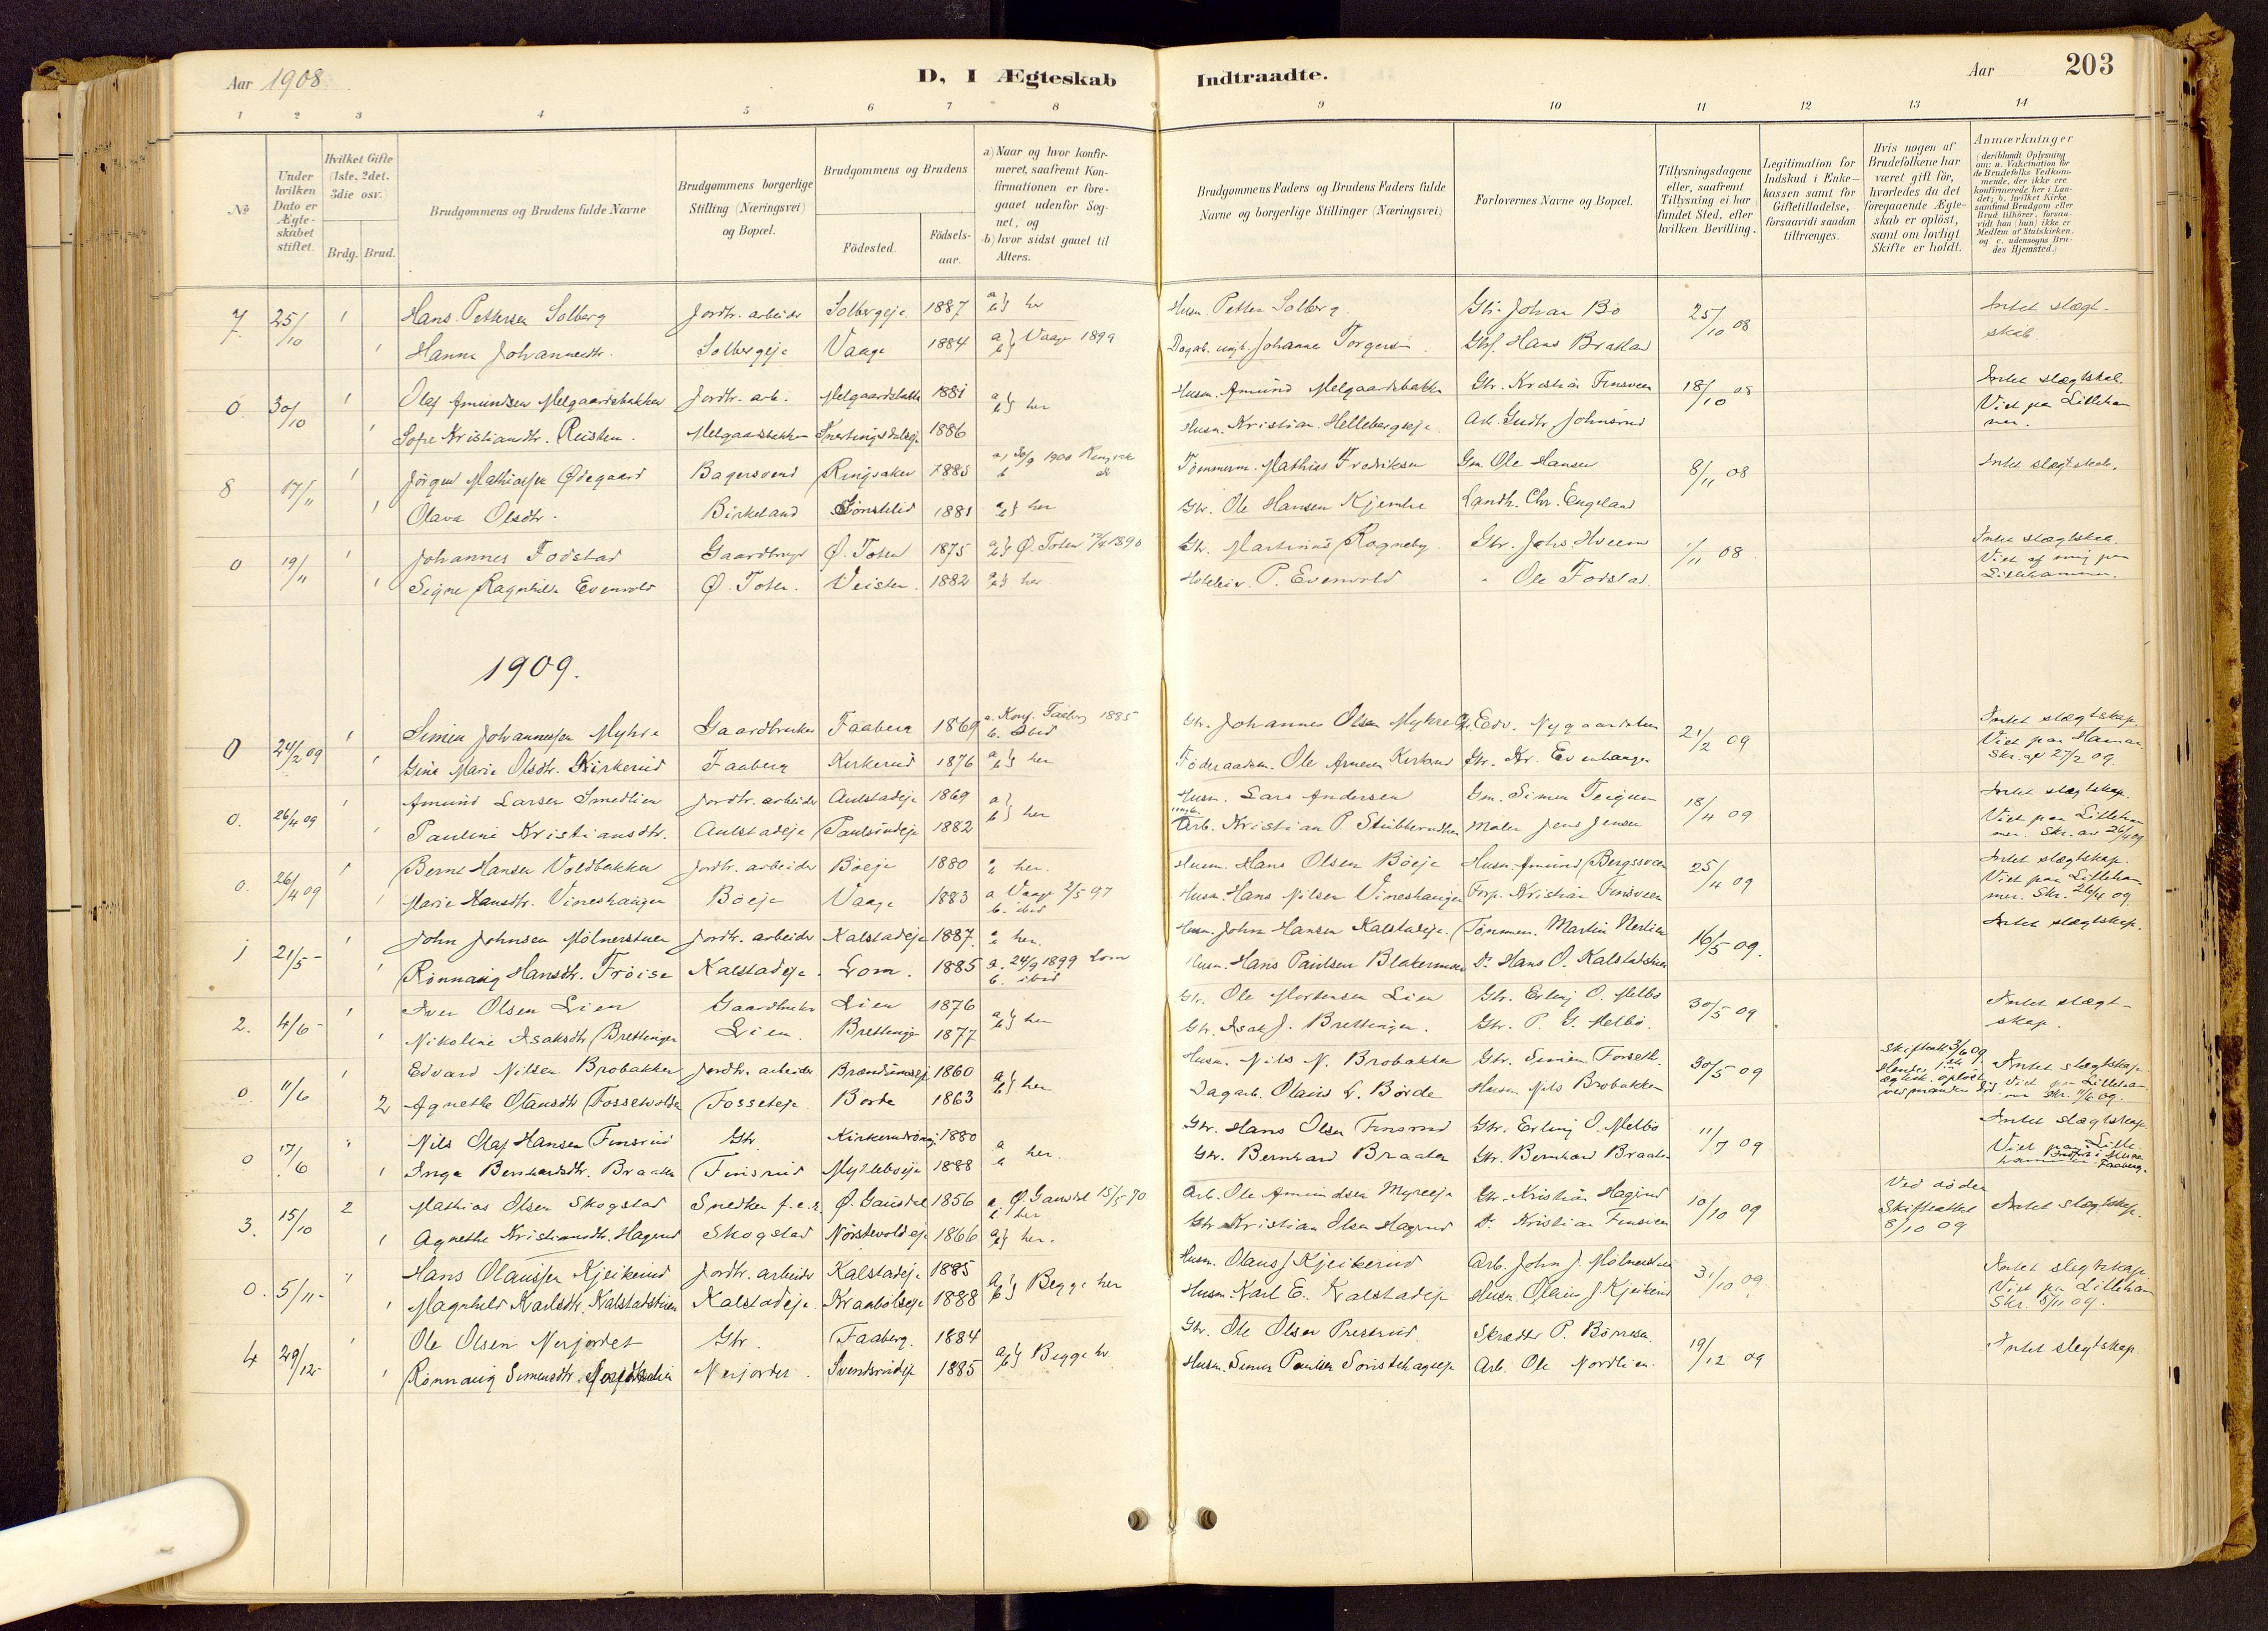 SAH, Vestre Gausdal prestekontor, Ministerialbok nr. 1, 1887-1914, s. 203